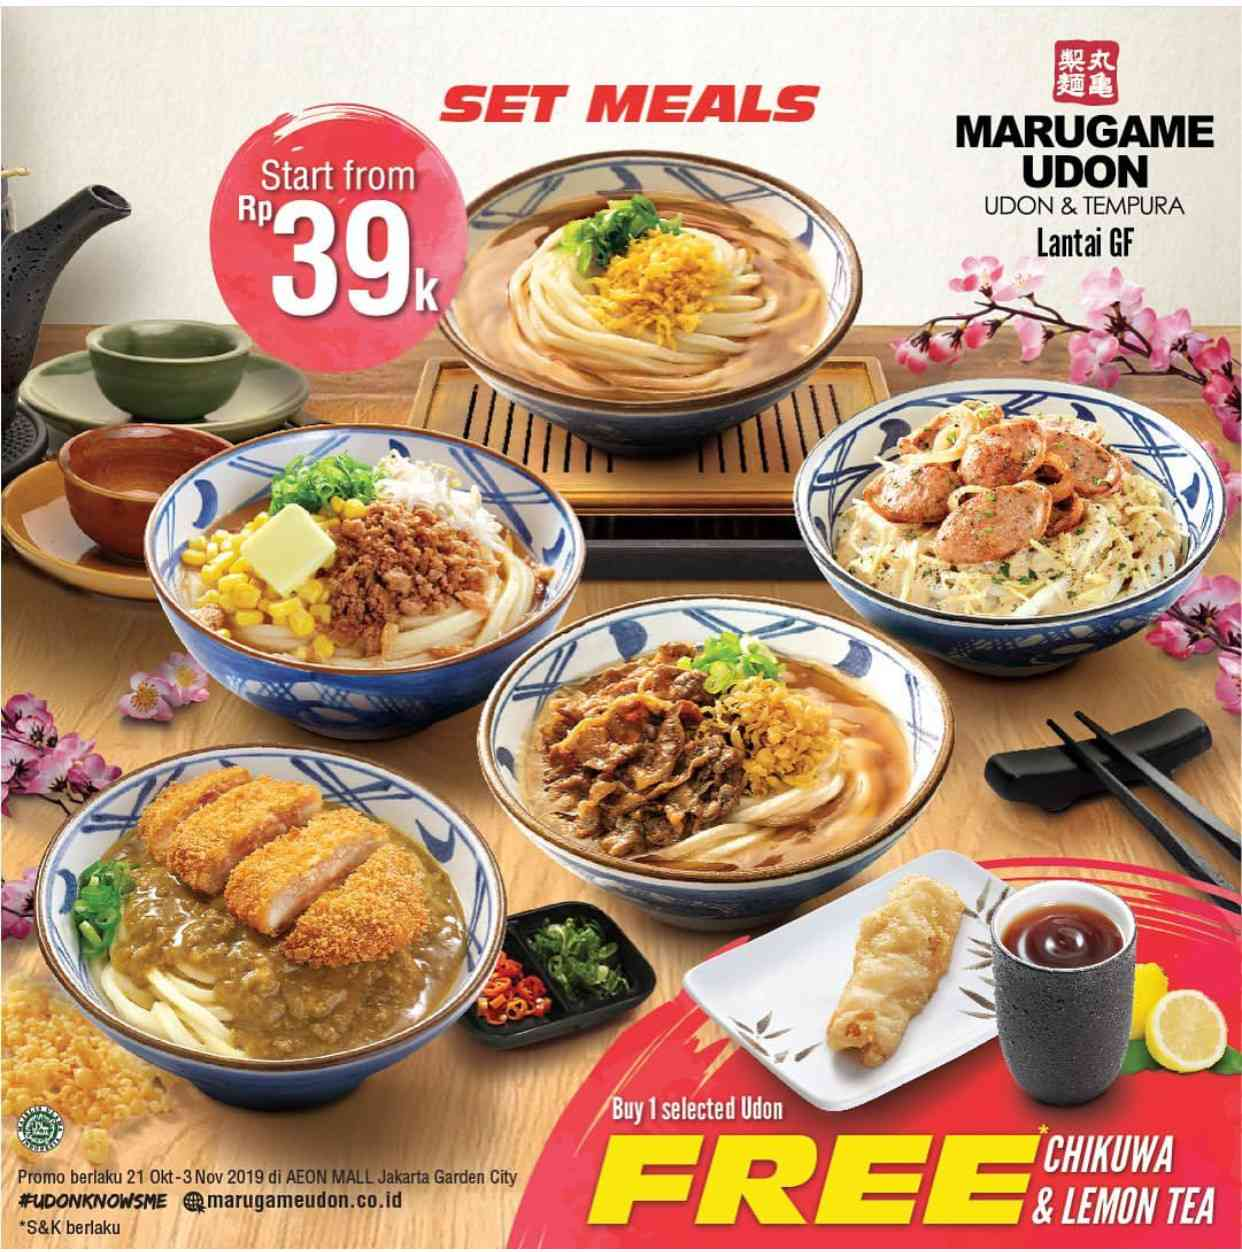 Diskon Marugame Udon Promo Set Meal mulai Rp. 39.000 saja